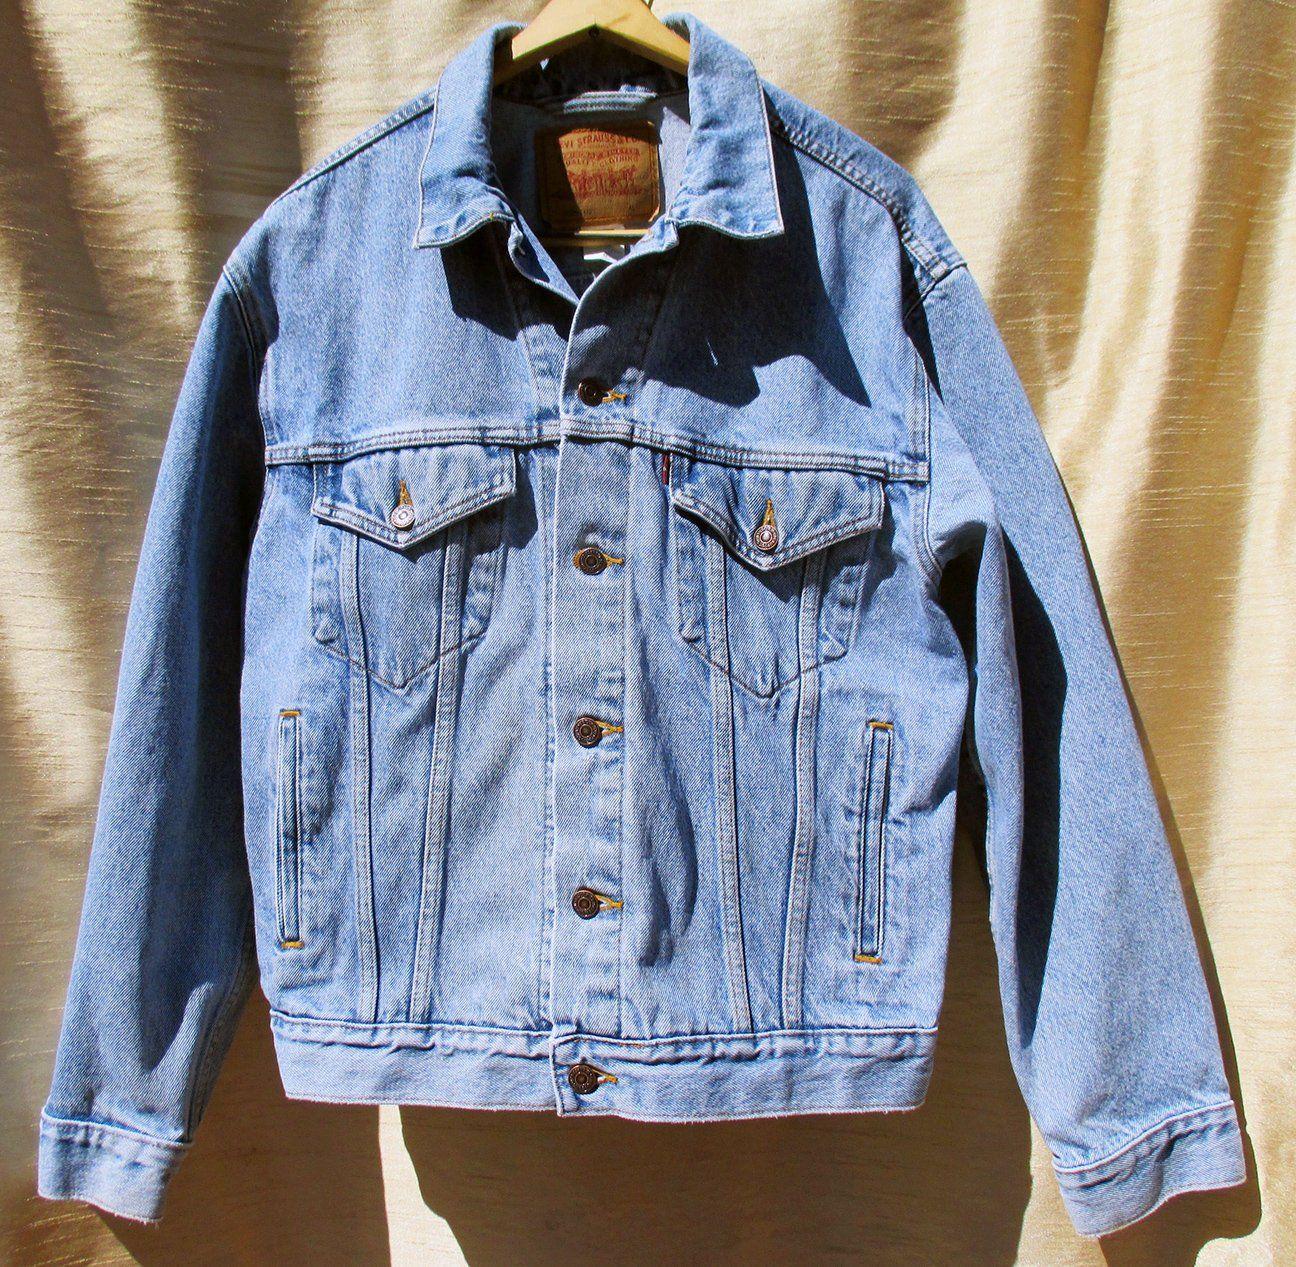 Men S M Classic Vintage 80s Red Tab Levi S Relaxed Etsy Blue Jean Jacket Streetwear Jackets Blue Denim [ 1267 x 1296 Pixel ]